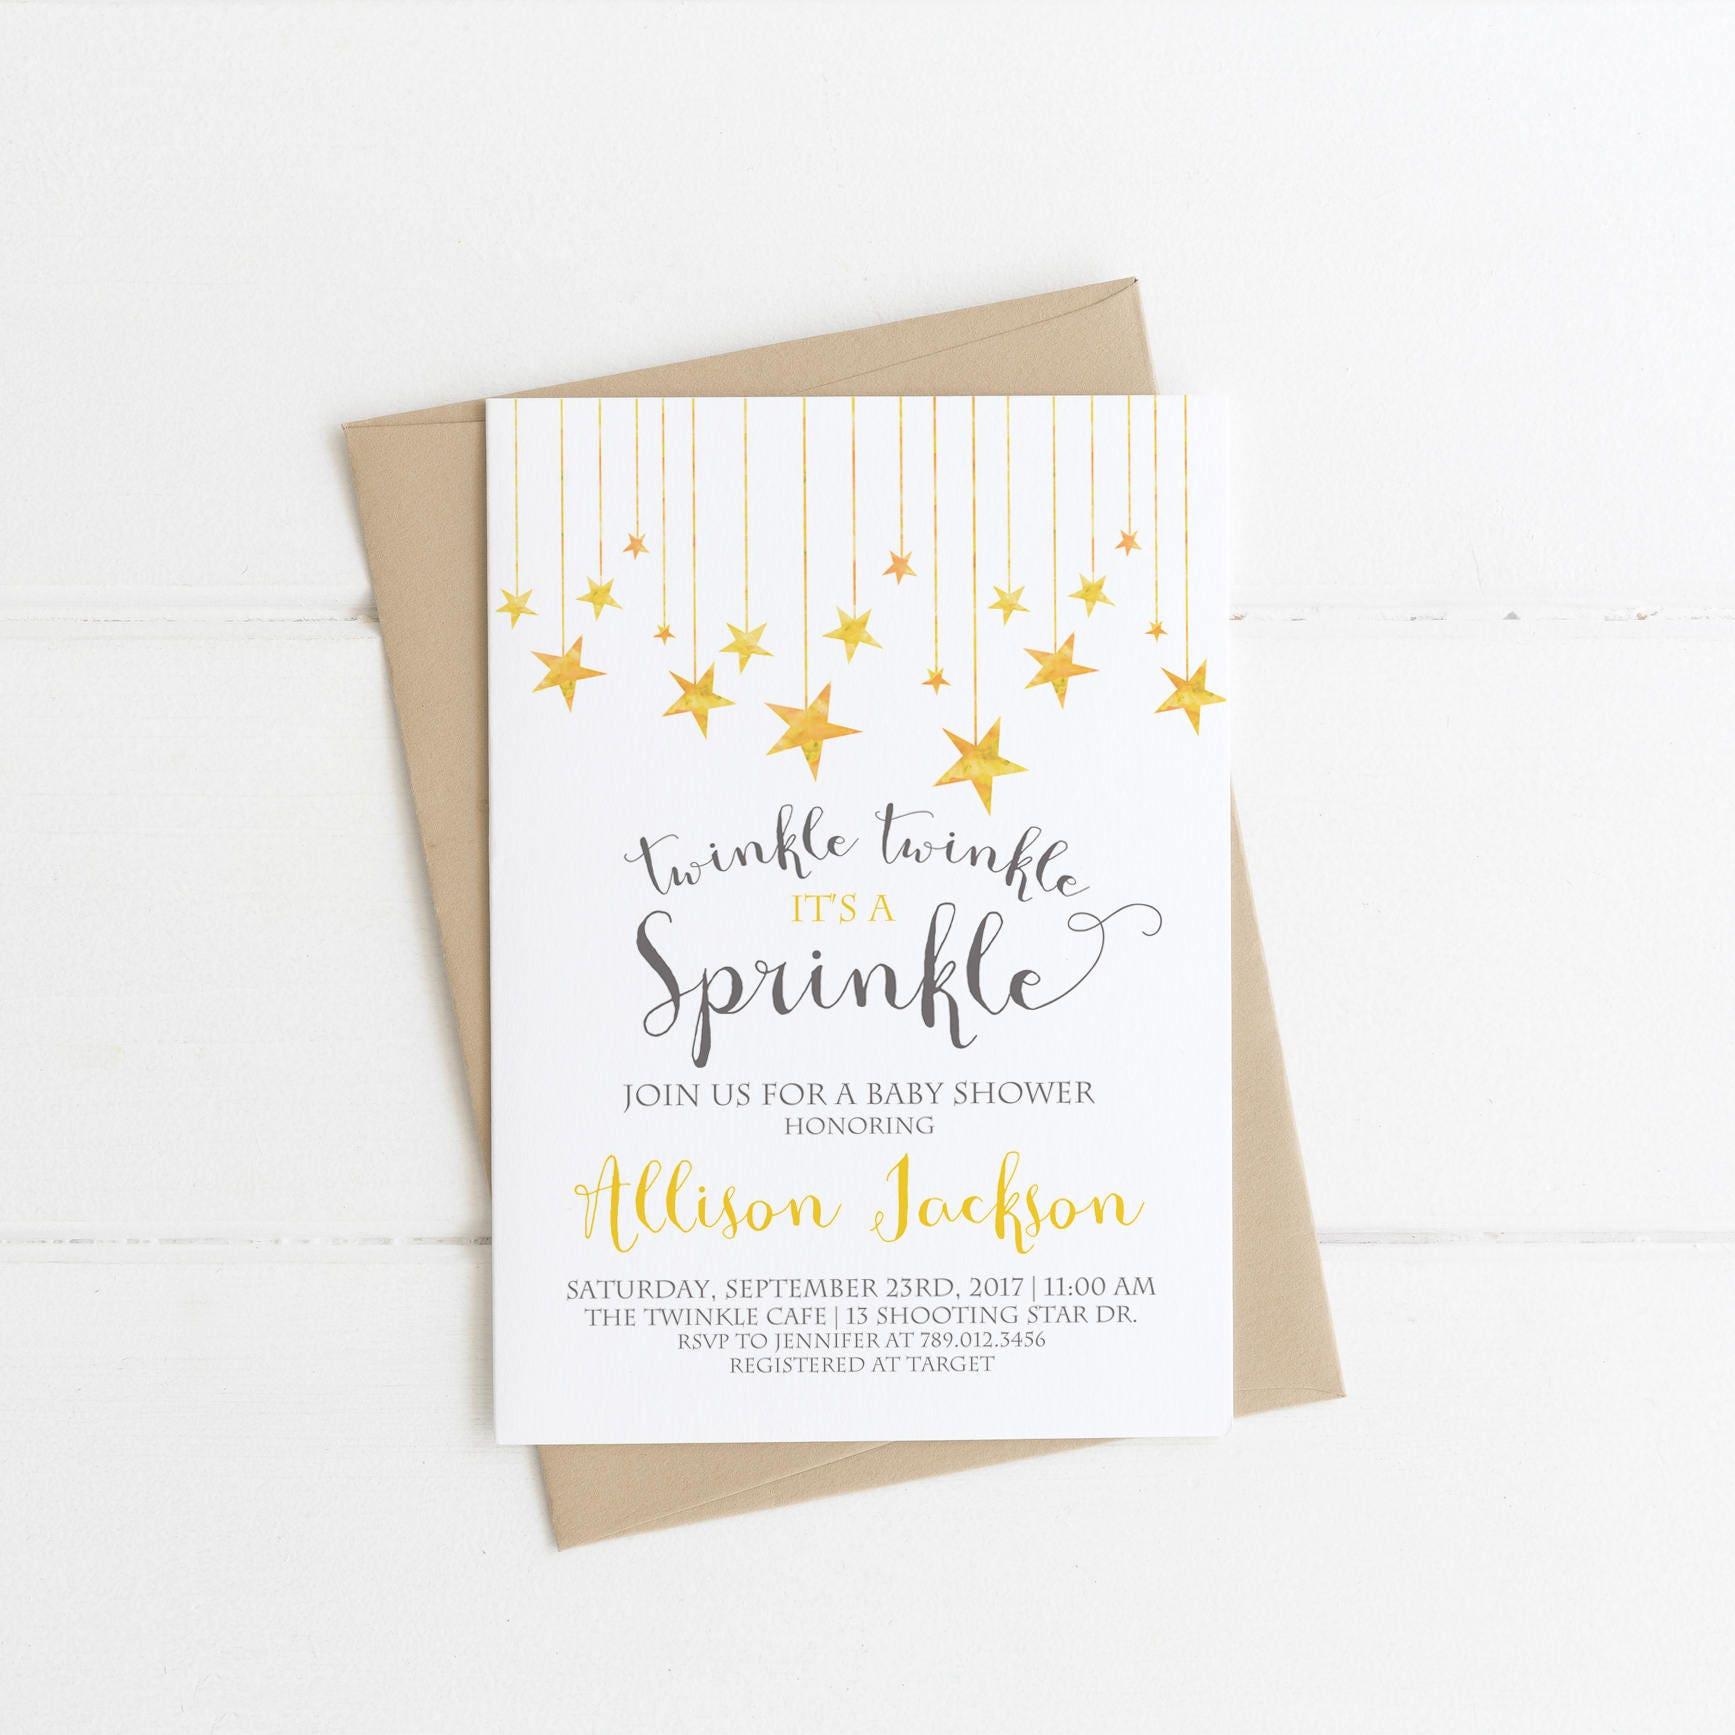 Twinkle Twinkle it s a Sprinkle Baby Shower Invitation